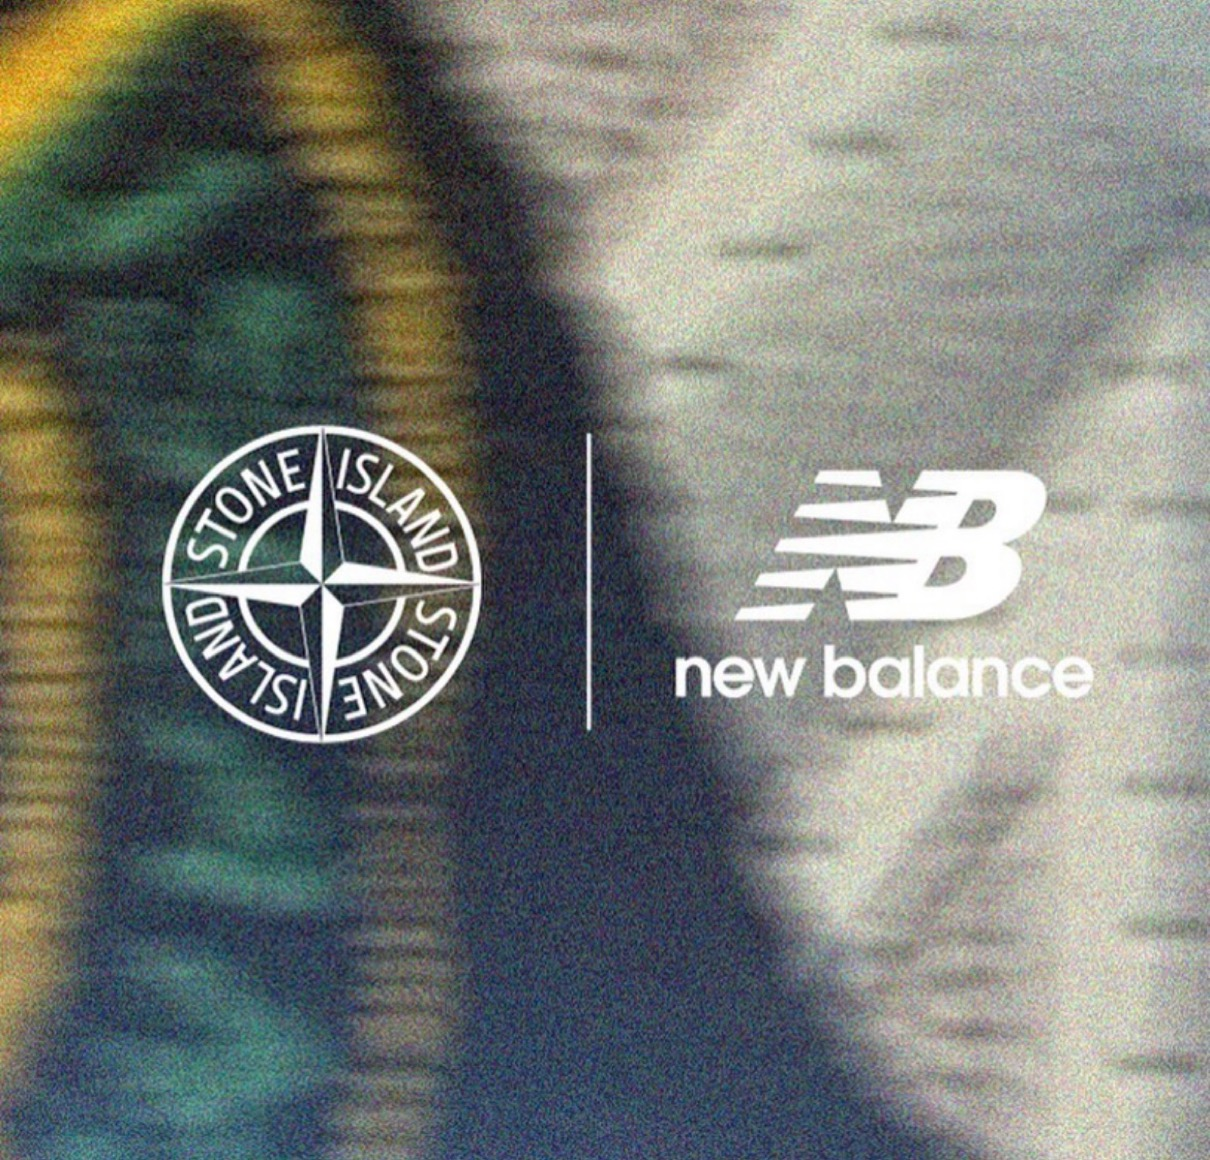 【Stone Island × New Balance】長期パートナーシップ締結を発表。今後コラボコレクションが発売予定